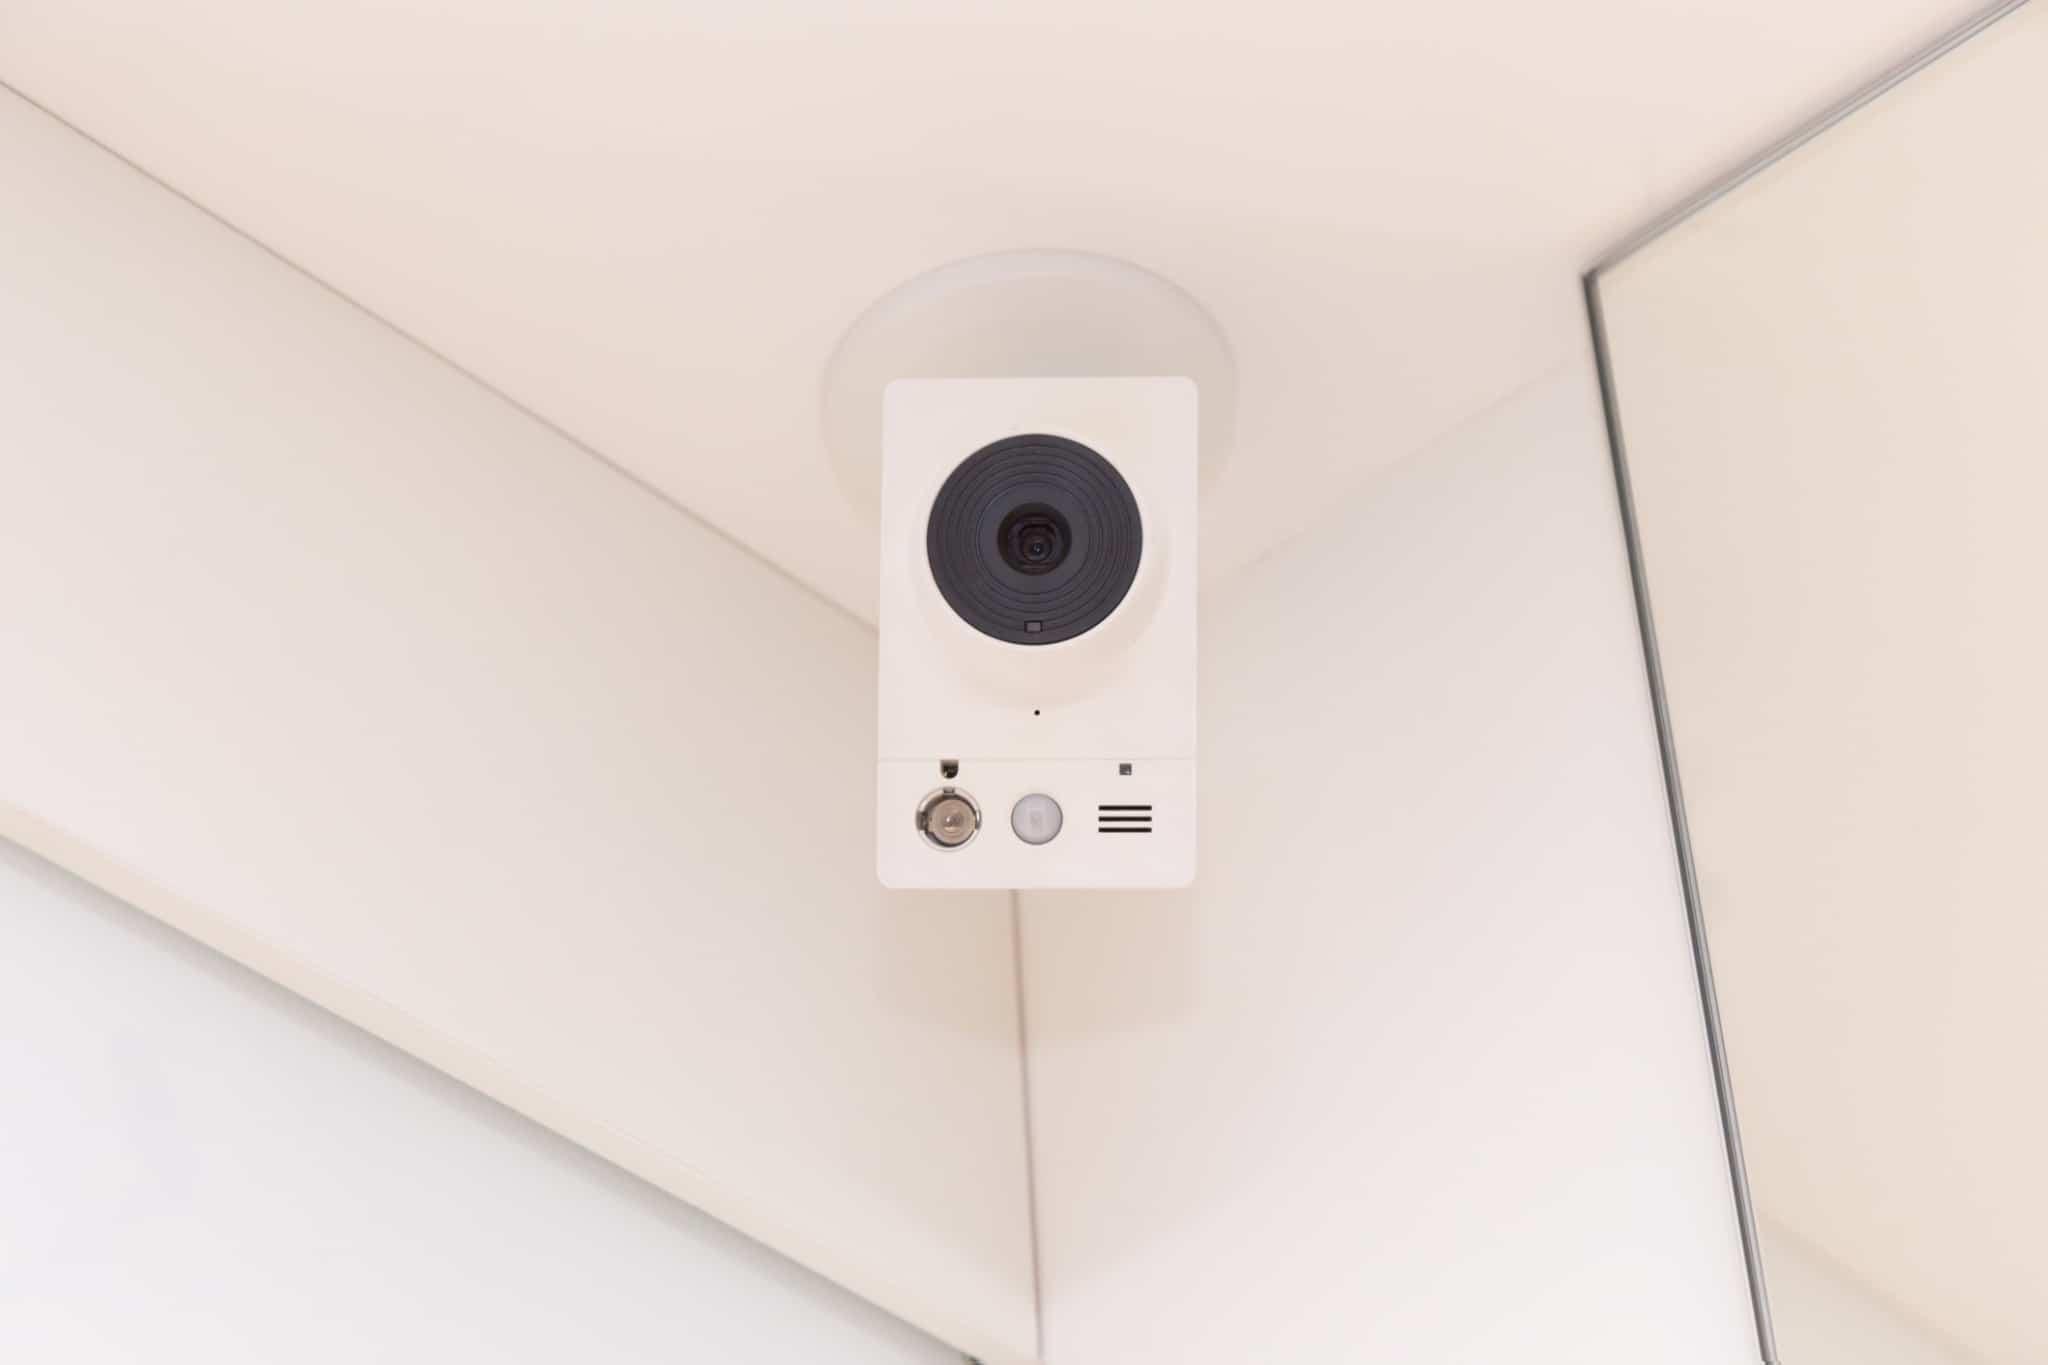 camara de vigilancia em casa